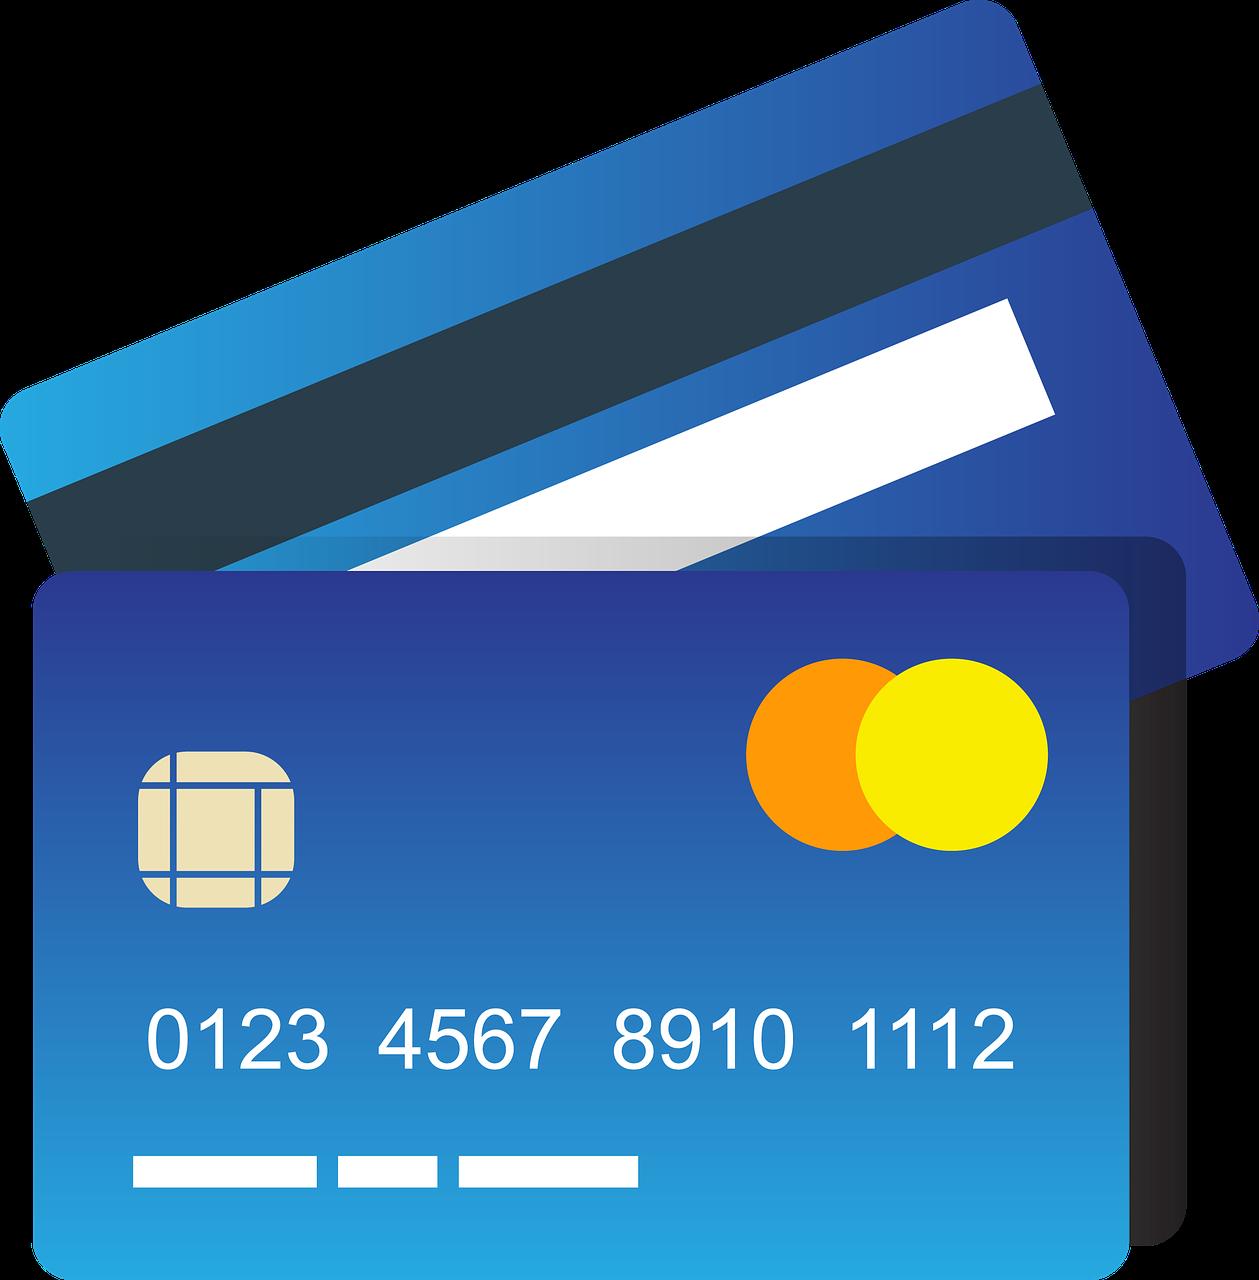 Cashback, rimborsi fino a 300 euro dal 1° gennaio